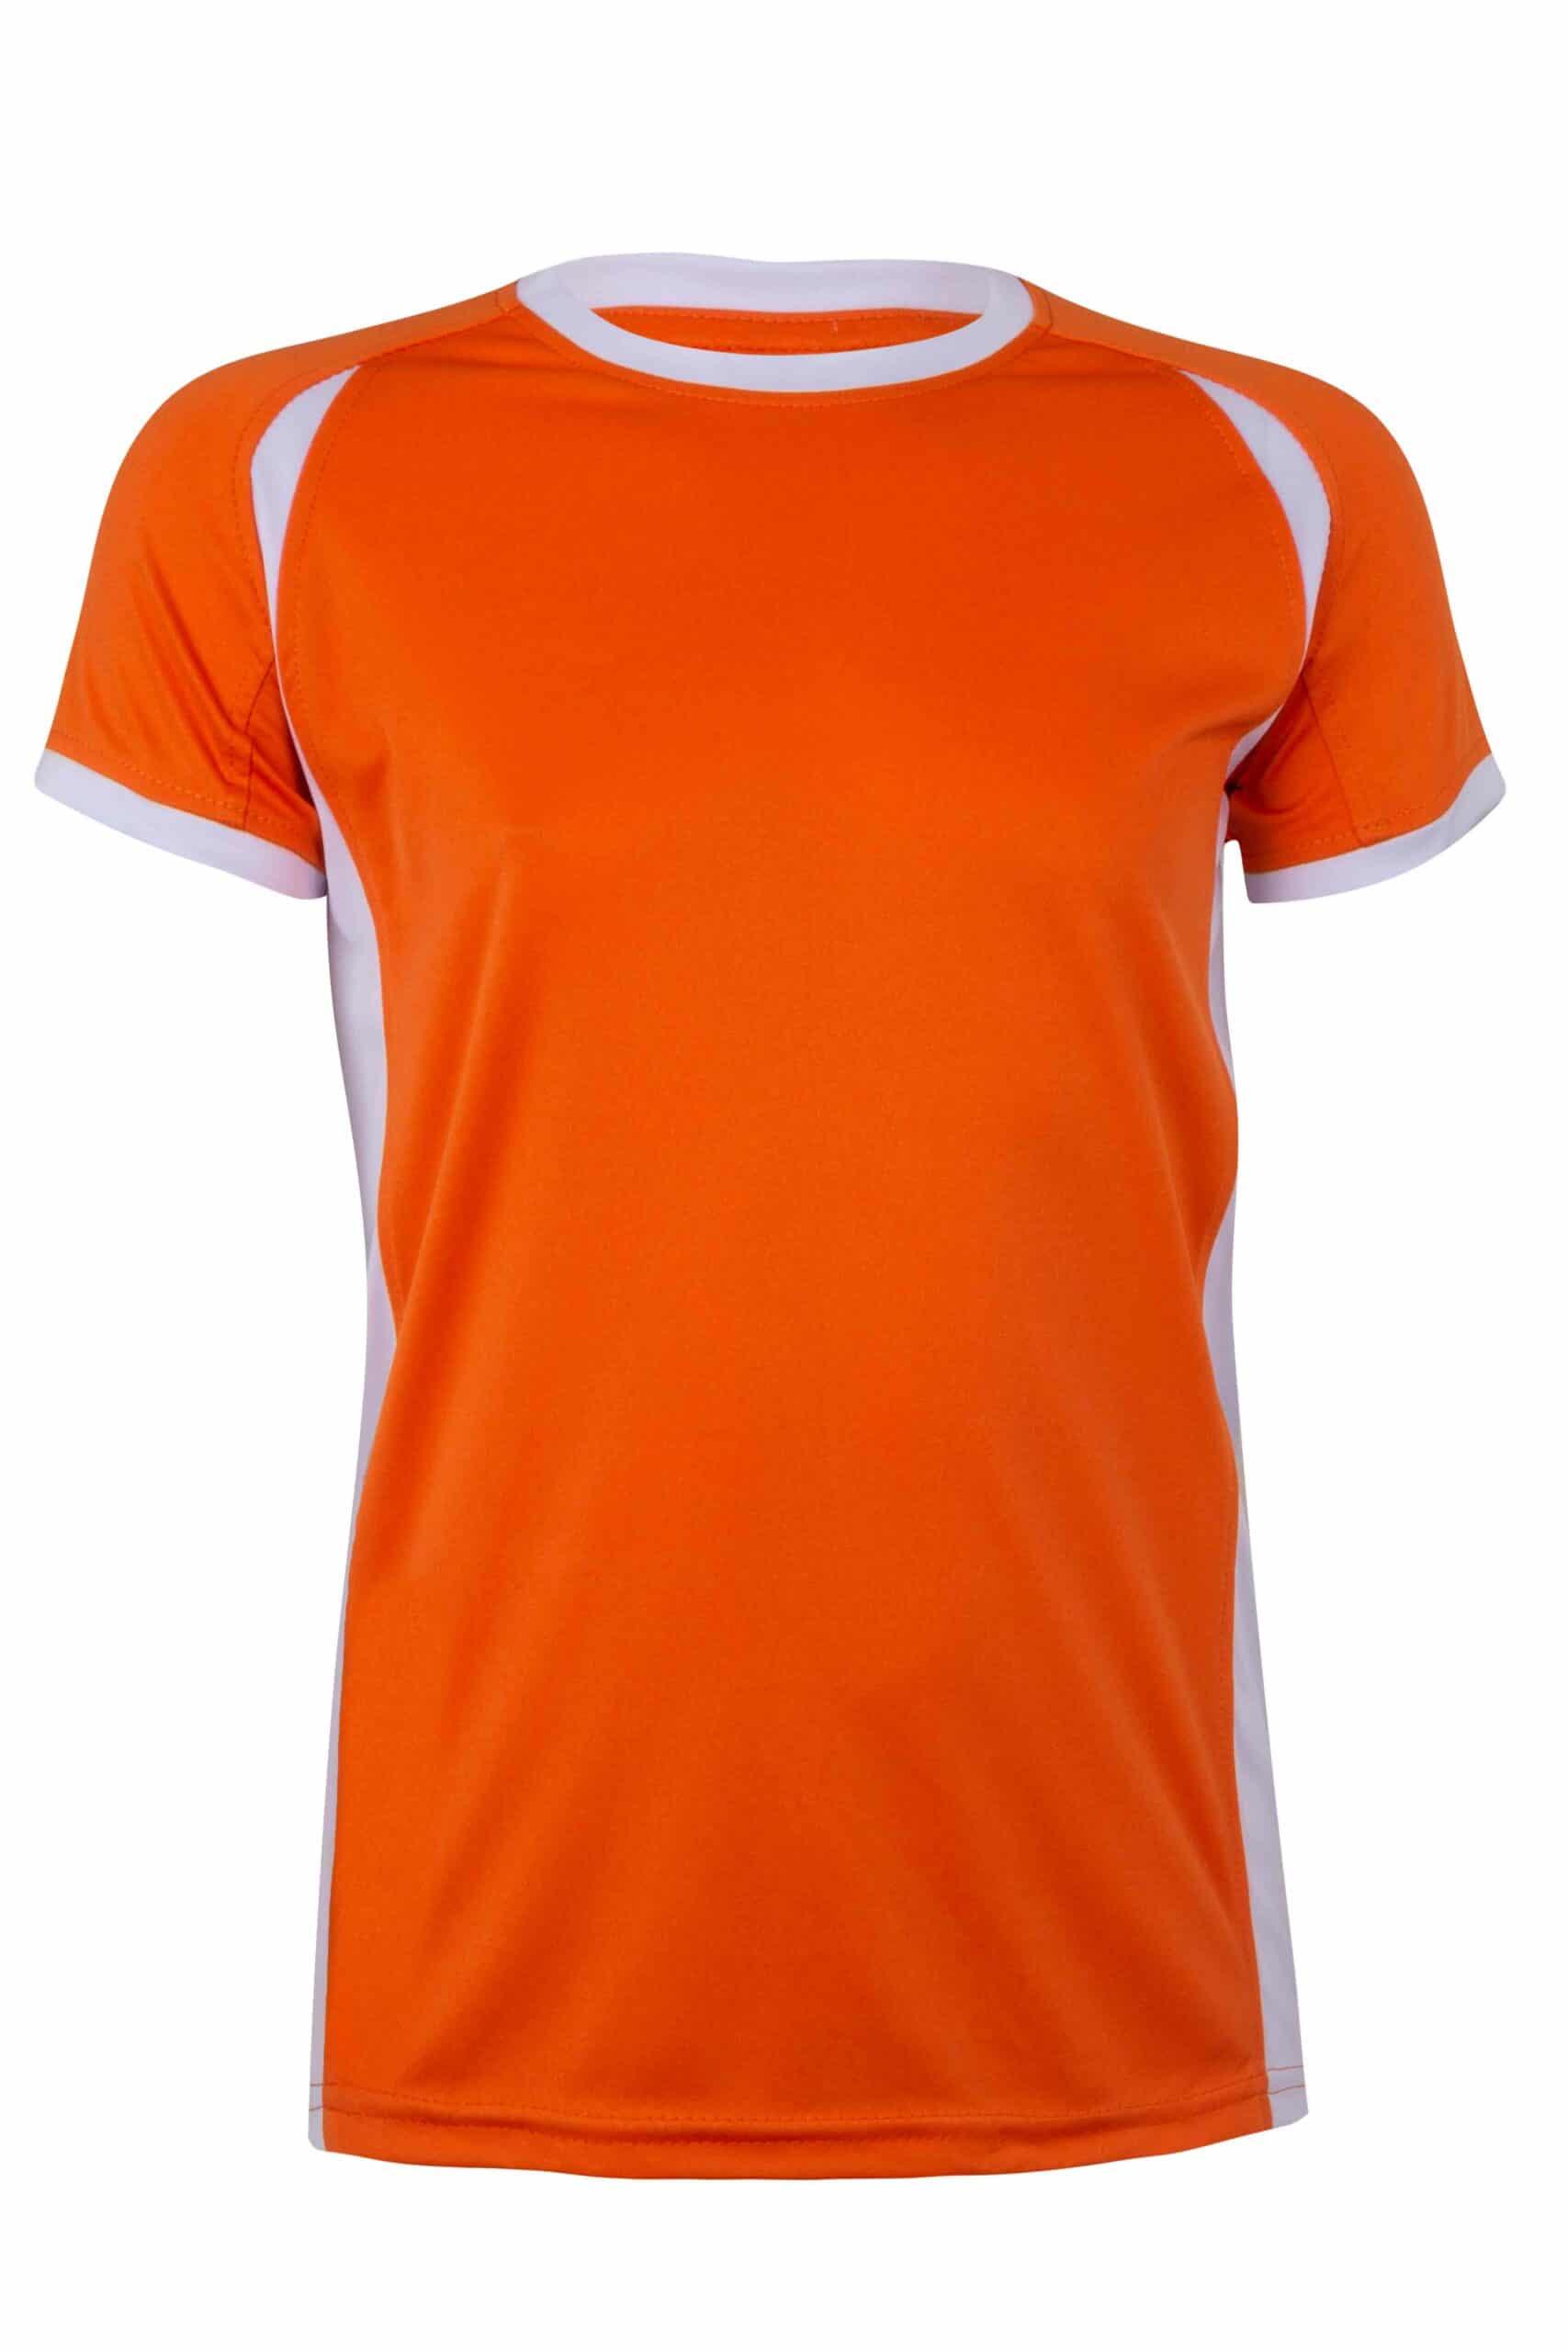 Mukua Mk531v Camiseta TÉcnica Manga Corta Bicolor NiÑo Orange White 1